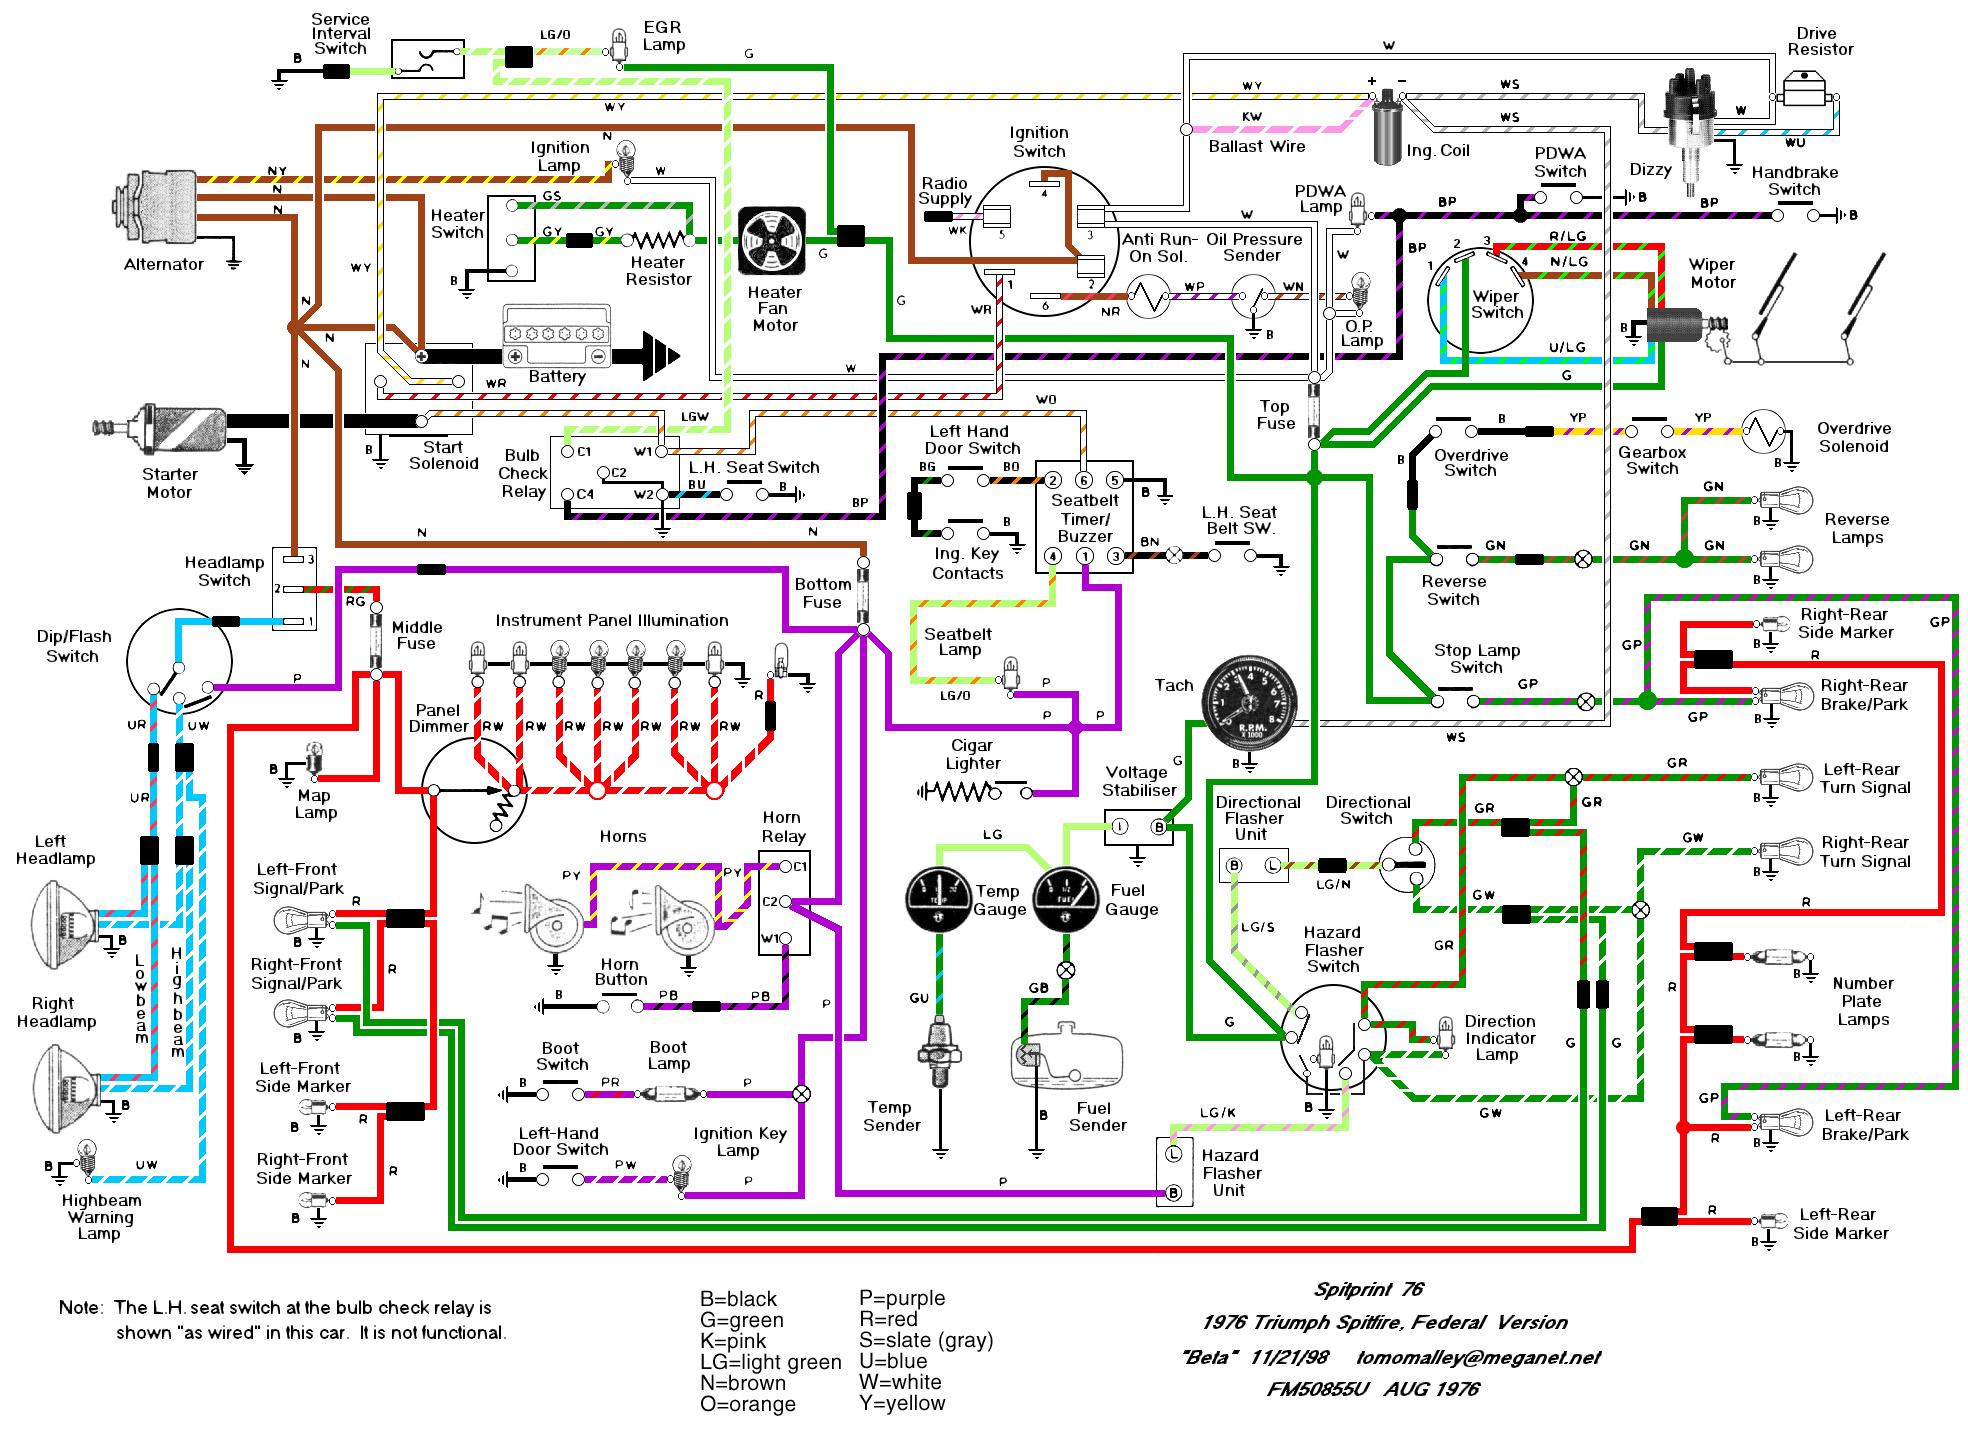 Automotive Wiring Diagrams Wiring Schematics For Cars Schema Wiring Diagrams